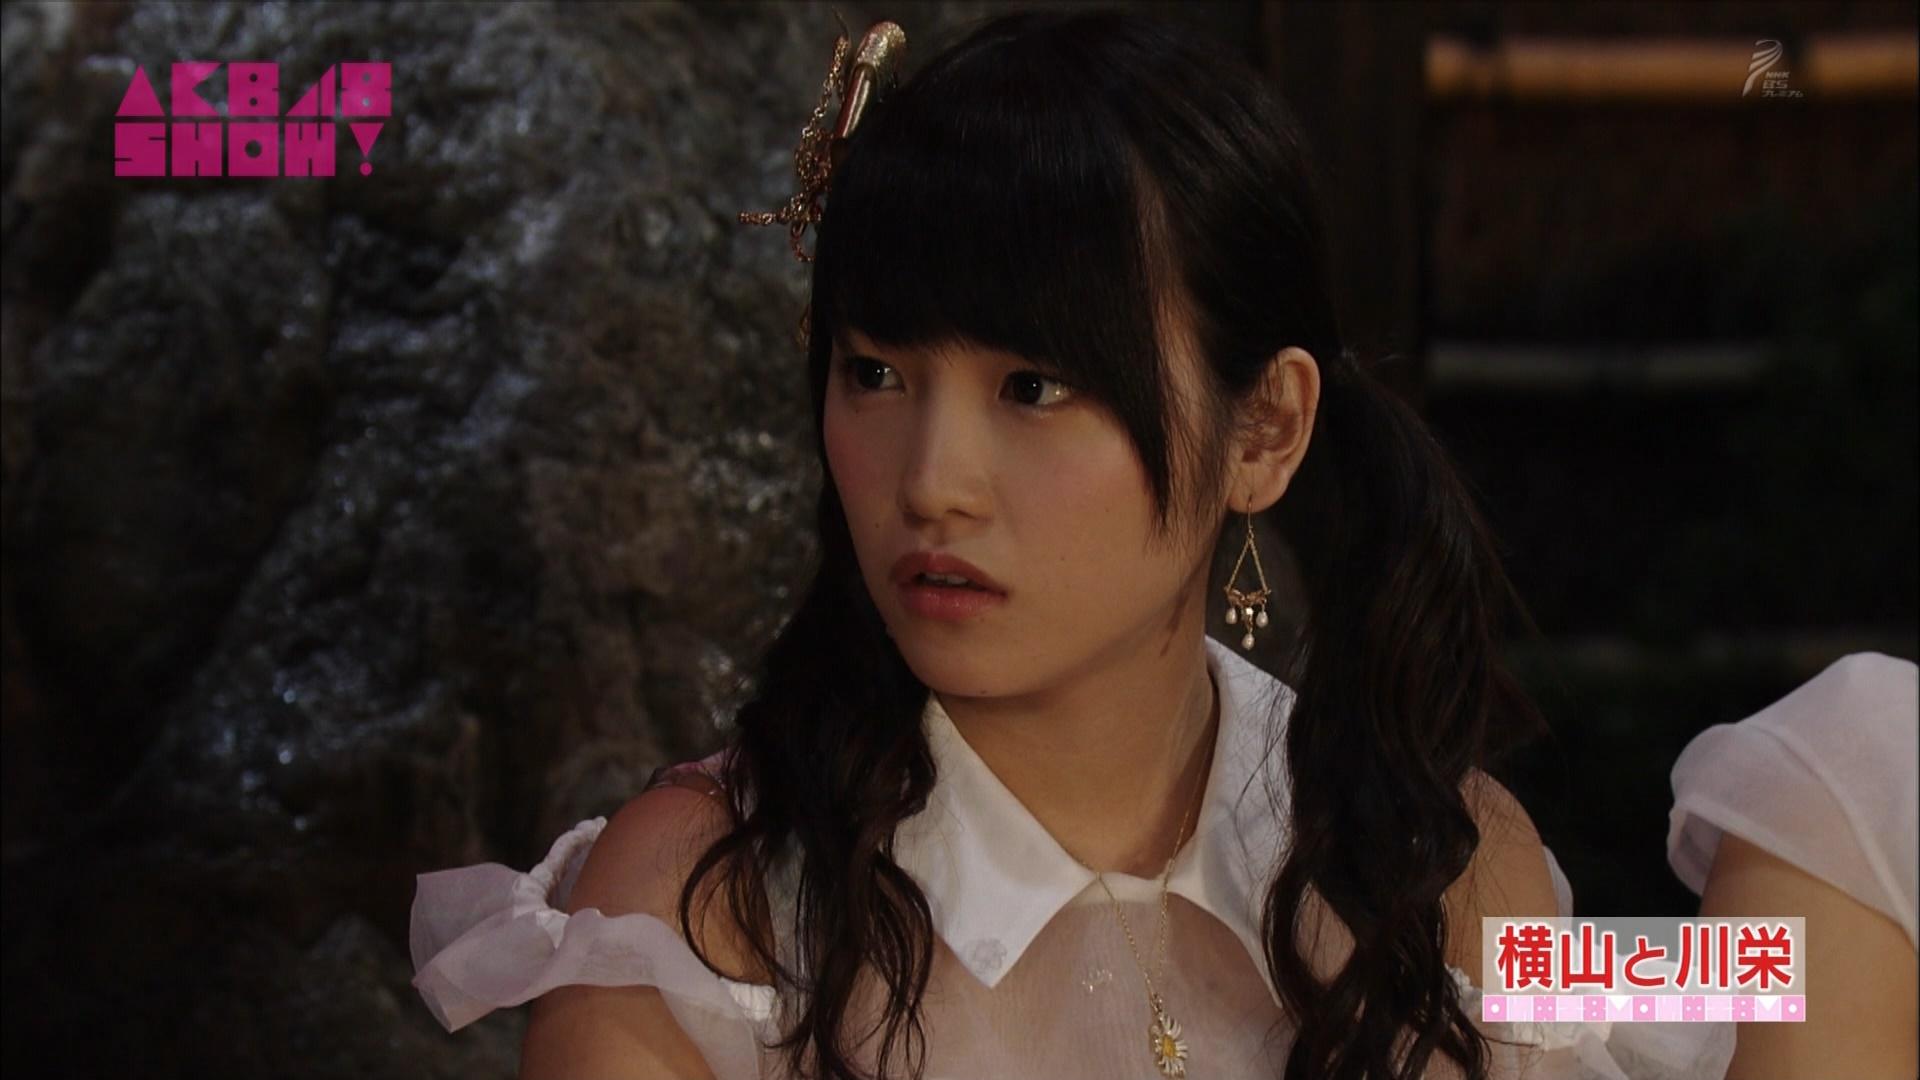 横山由依と川栄李奈 AKB48SHOW! 20140906 (29)